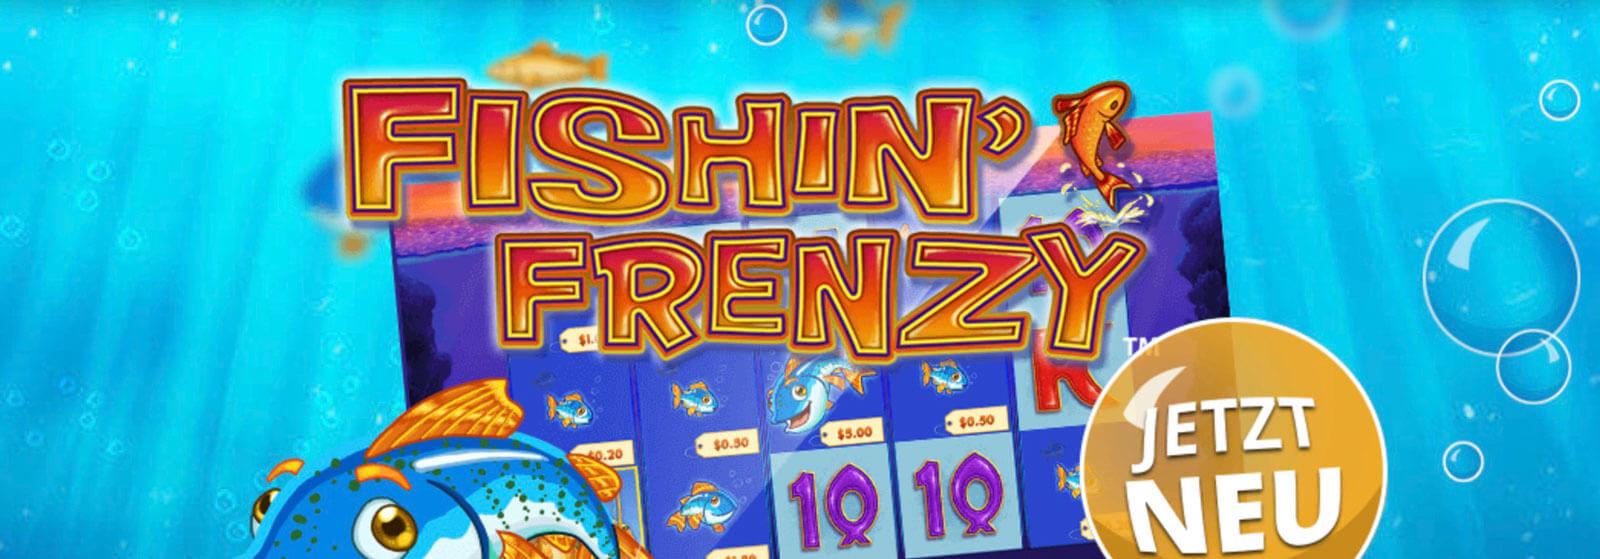 Neue Casino Sportwetten 212502